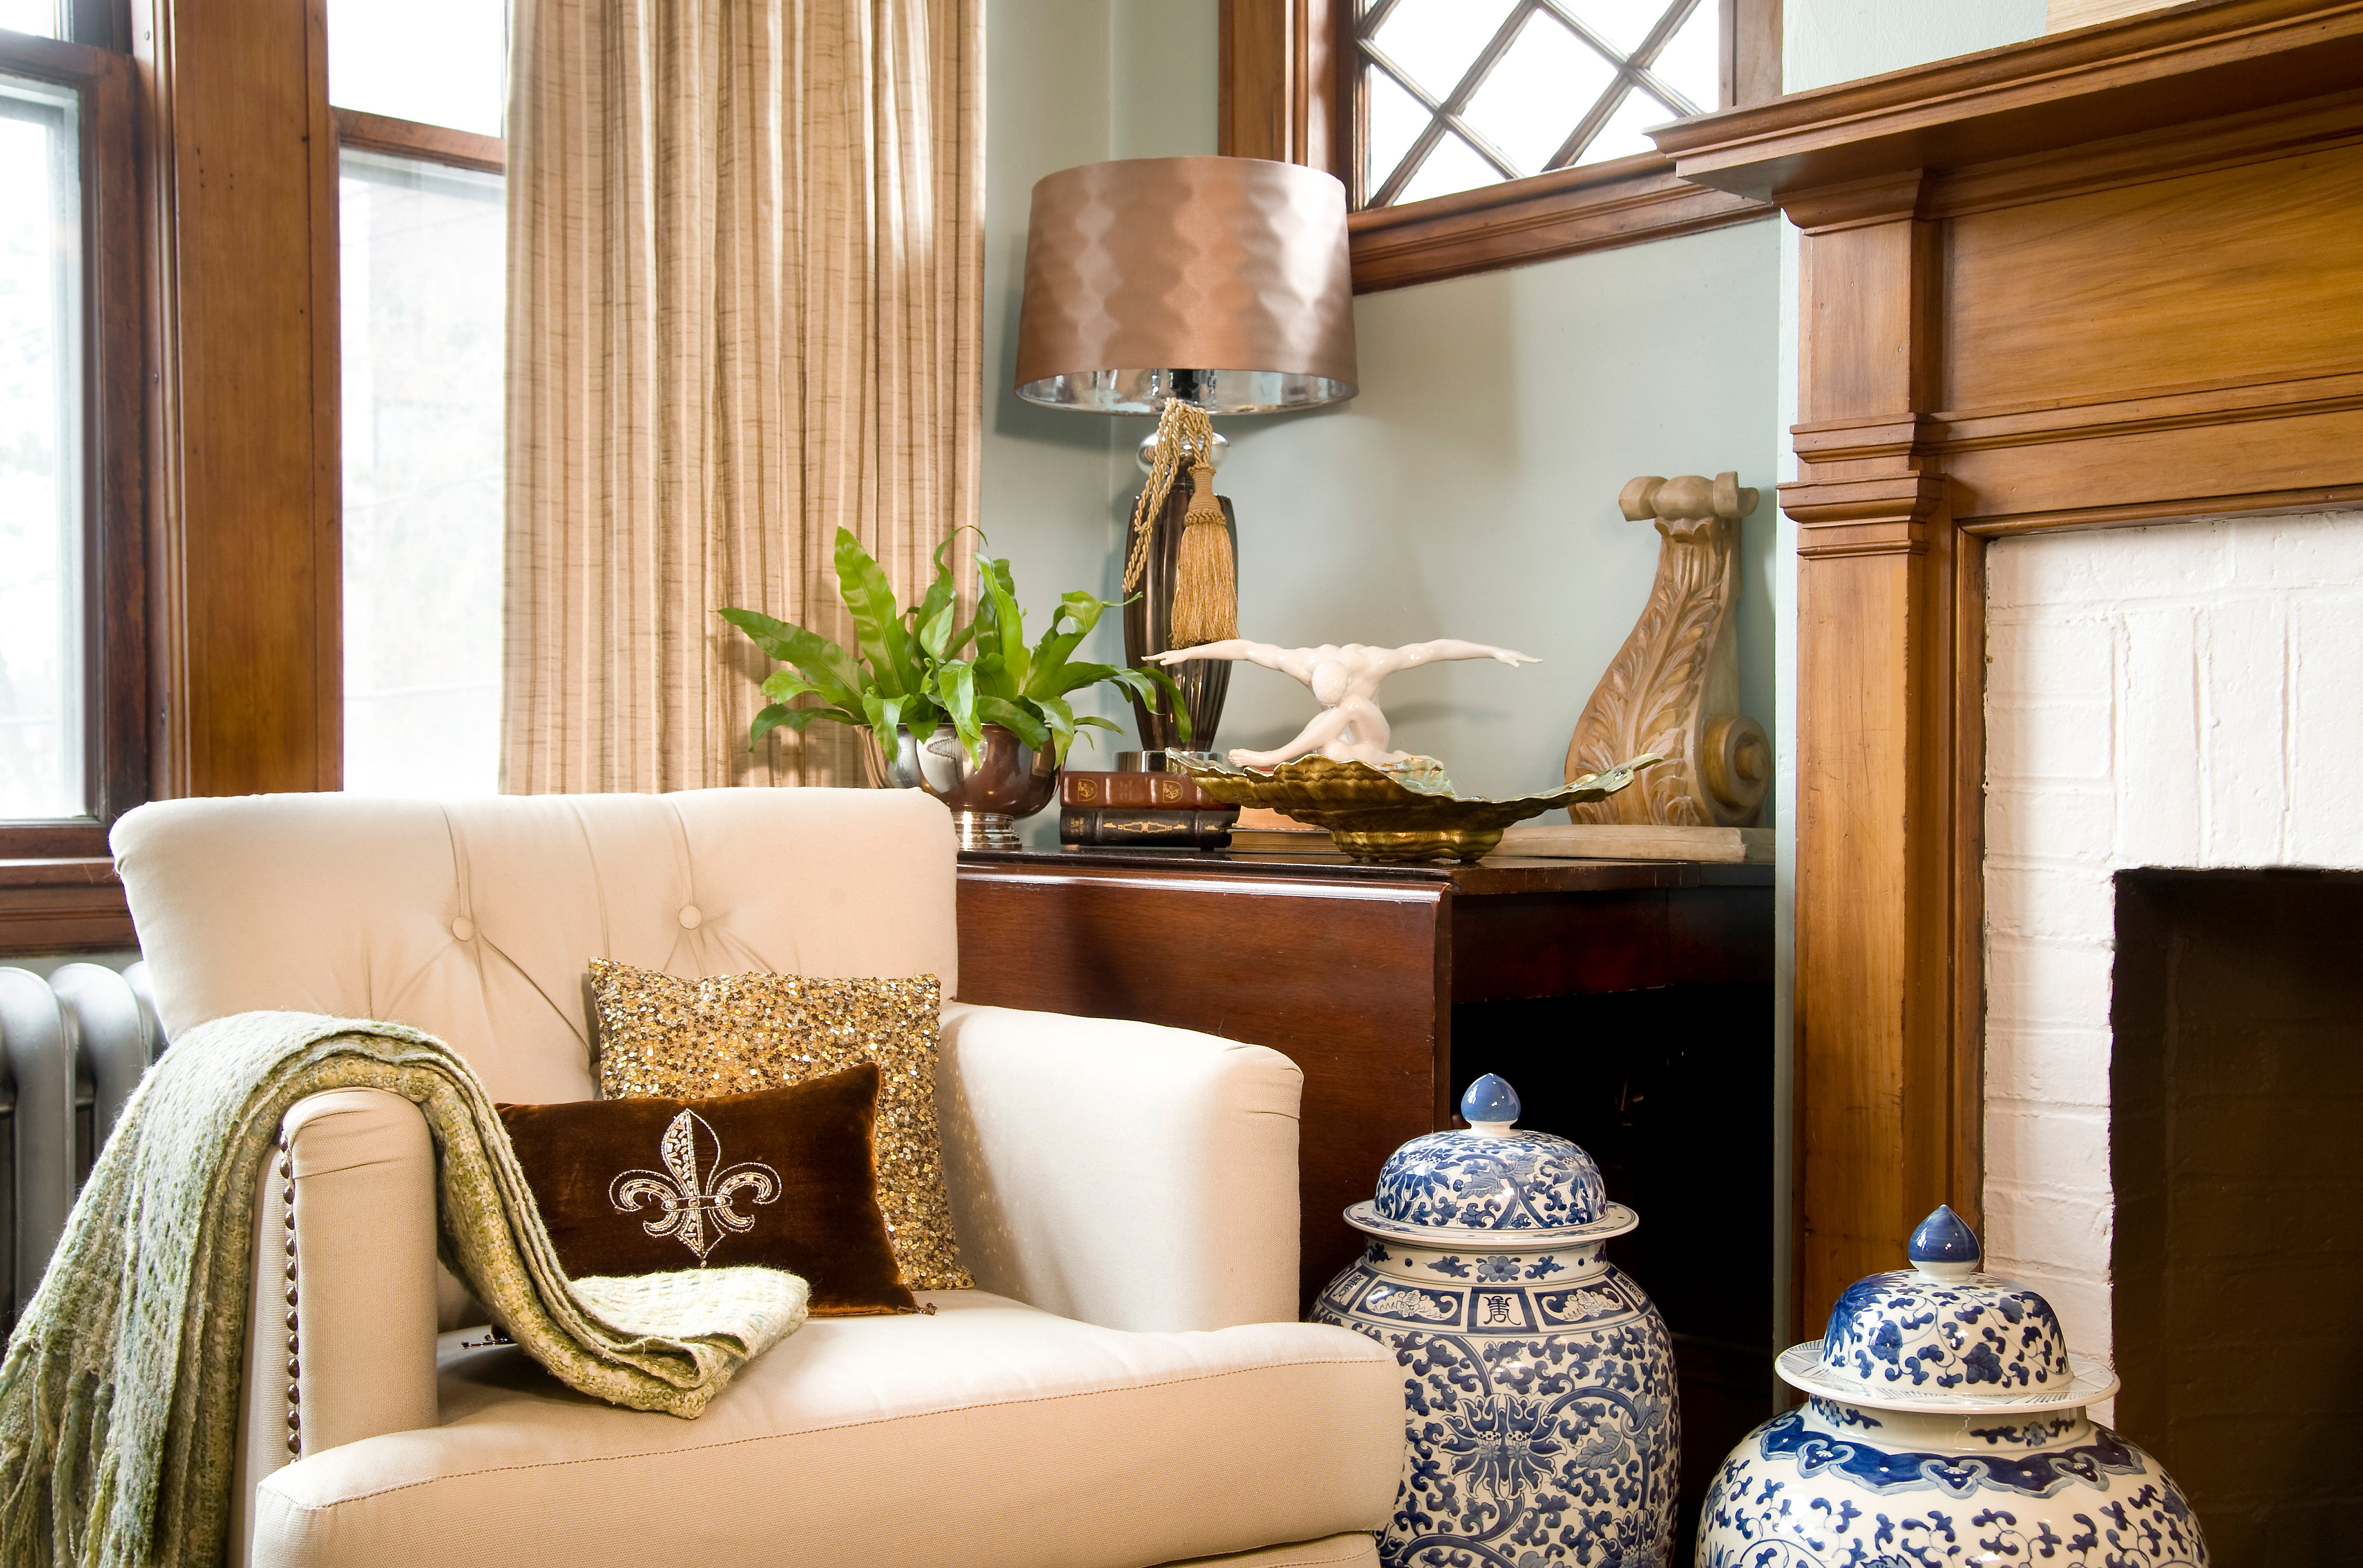 Of Living Rooms With Interior Designs Boston Interior Designer Lifestyle Brand Transitional